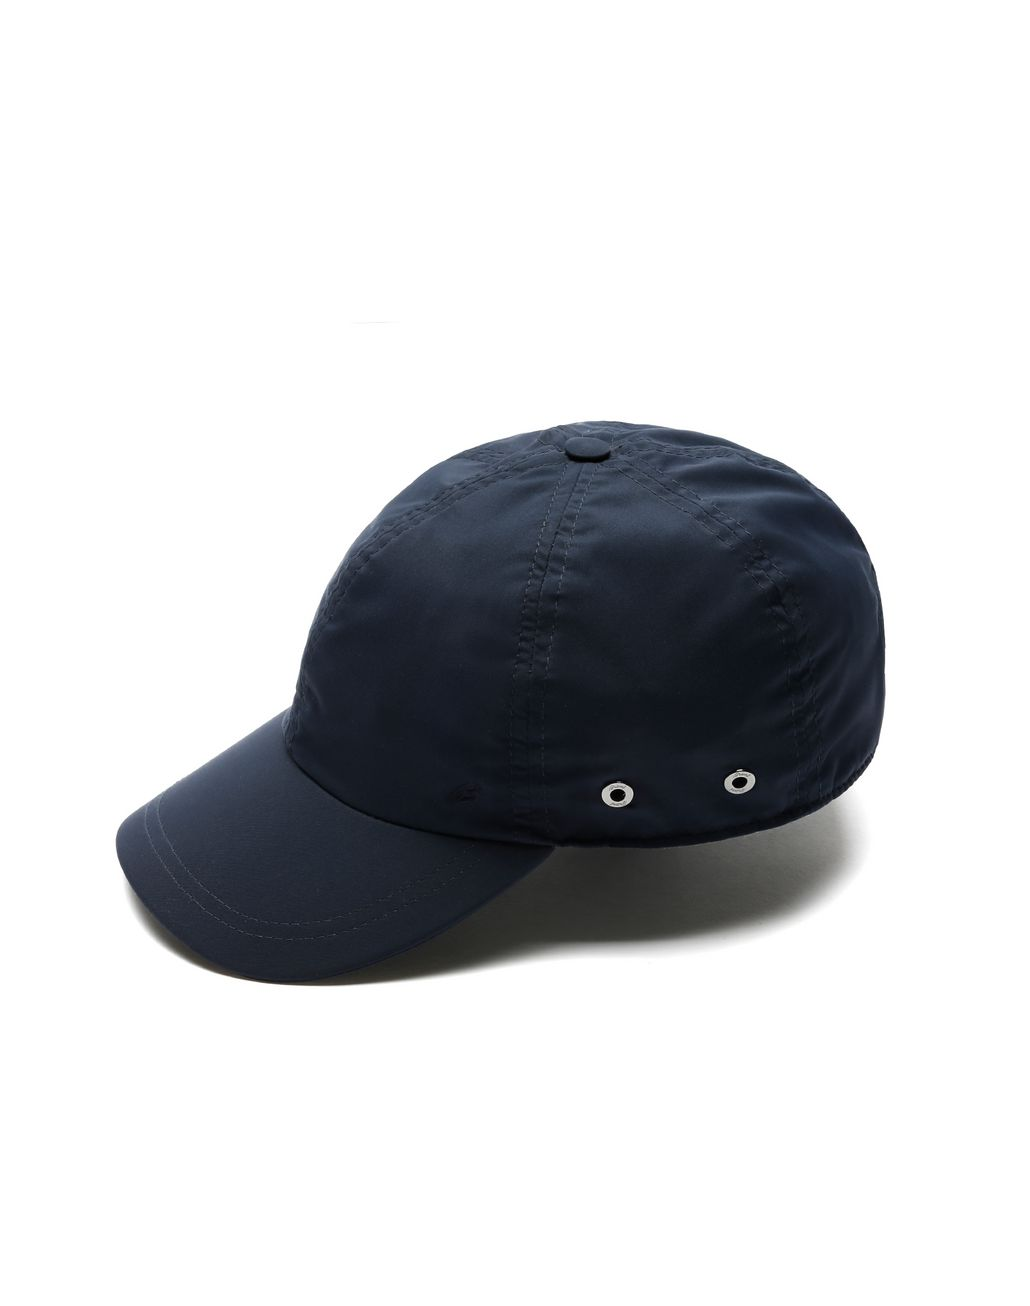 BRIONI Navy Blue Baseball Hat Hats   Gloves       pickupInStoreShippingNotGuaranteed info     9c363d187f4